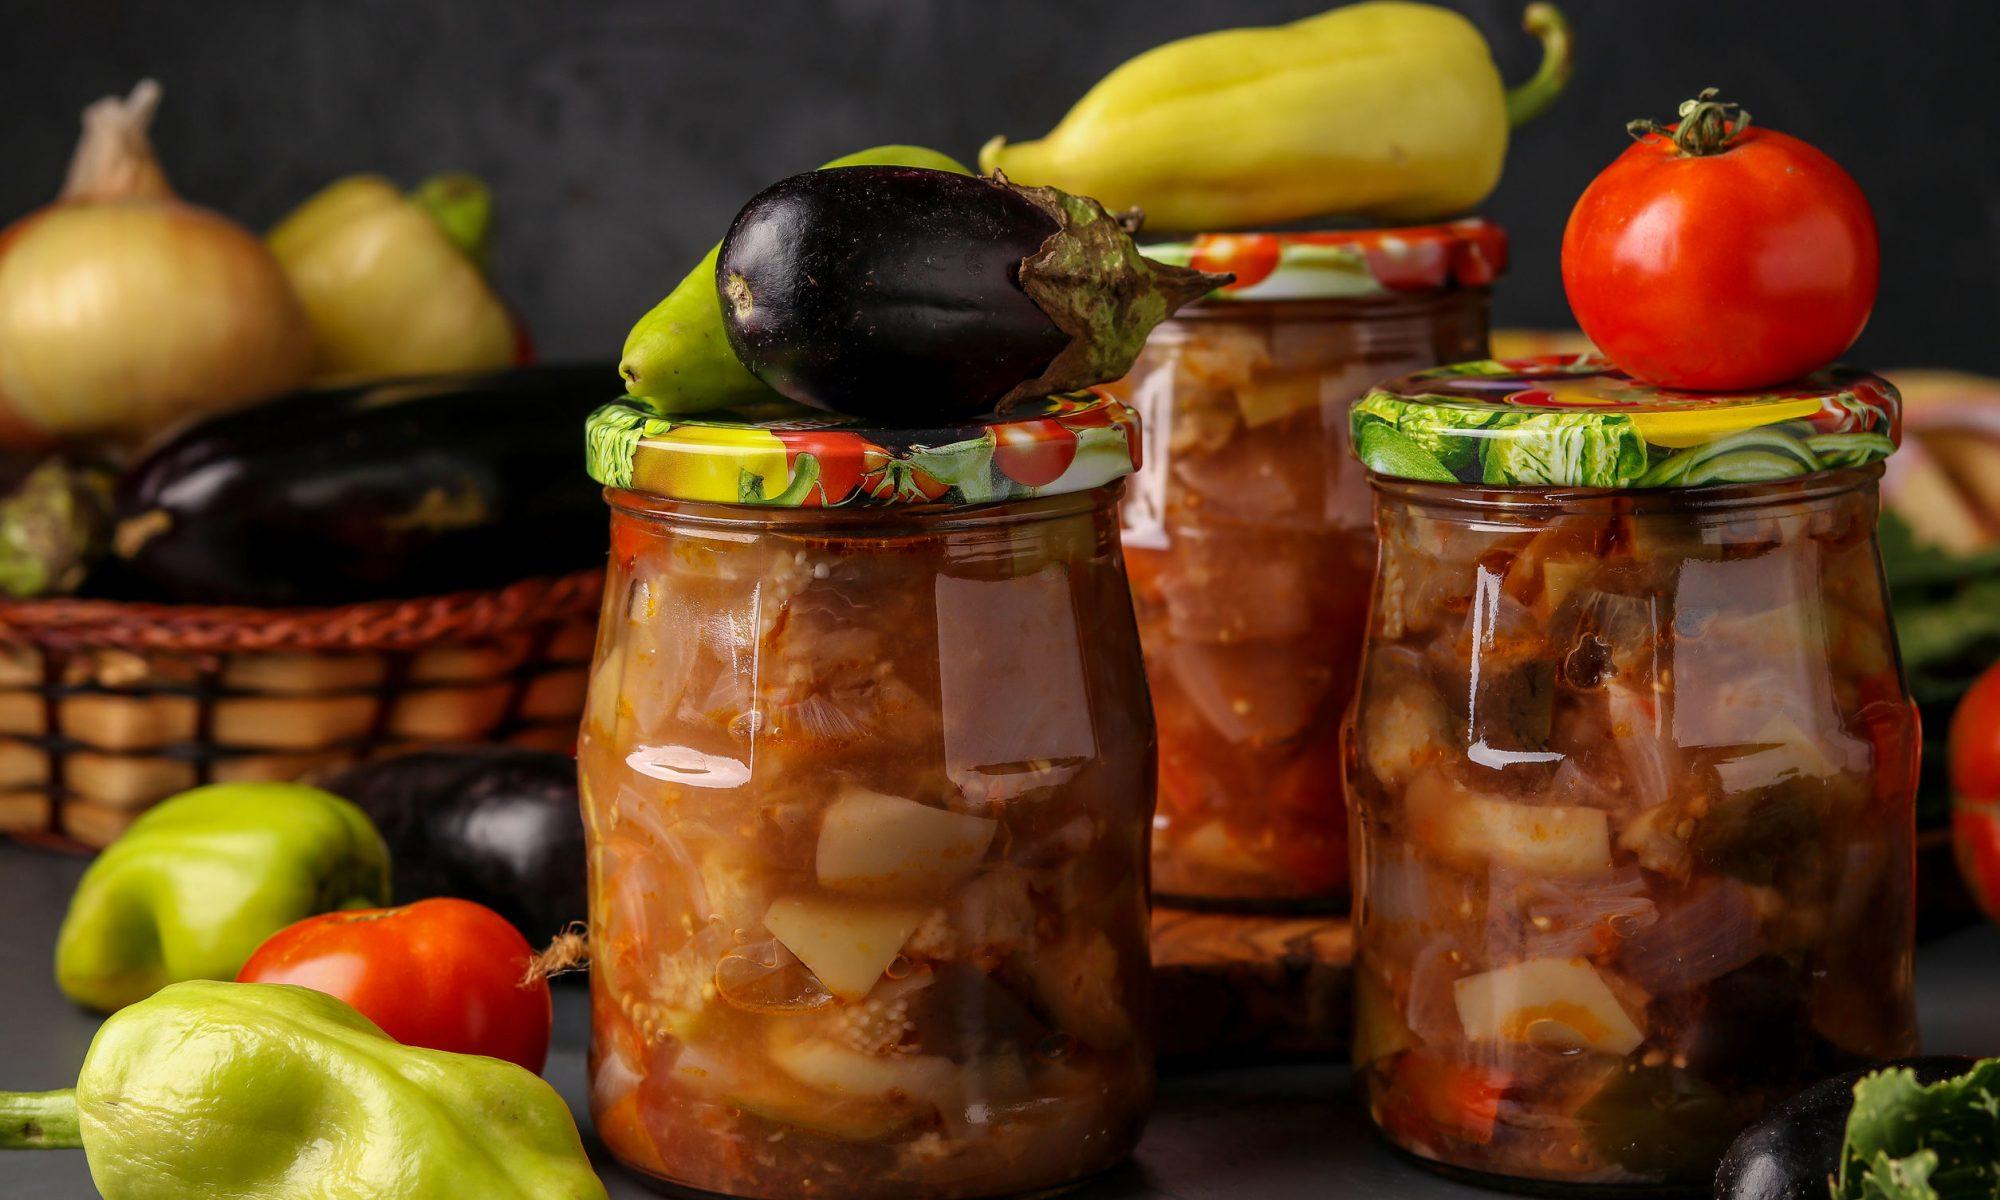 Румынская овощная закуска